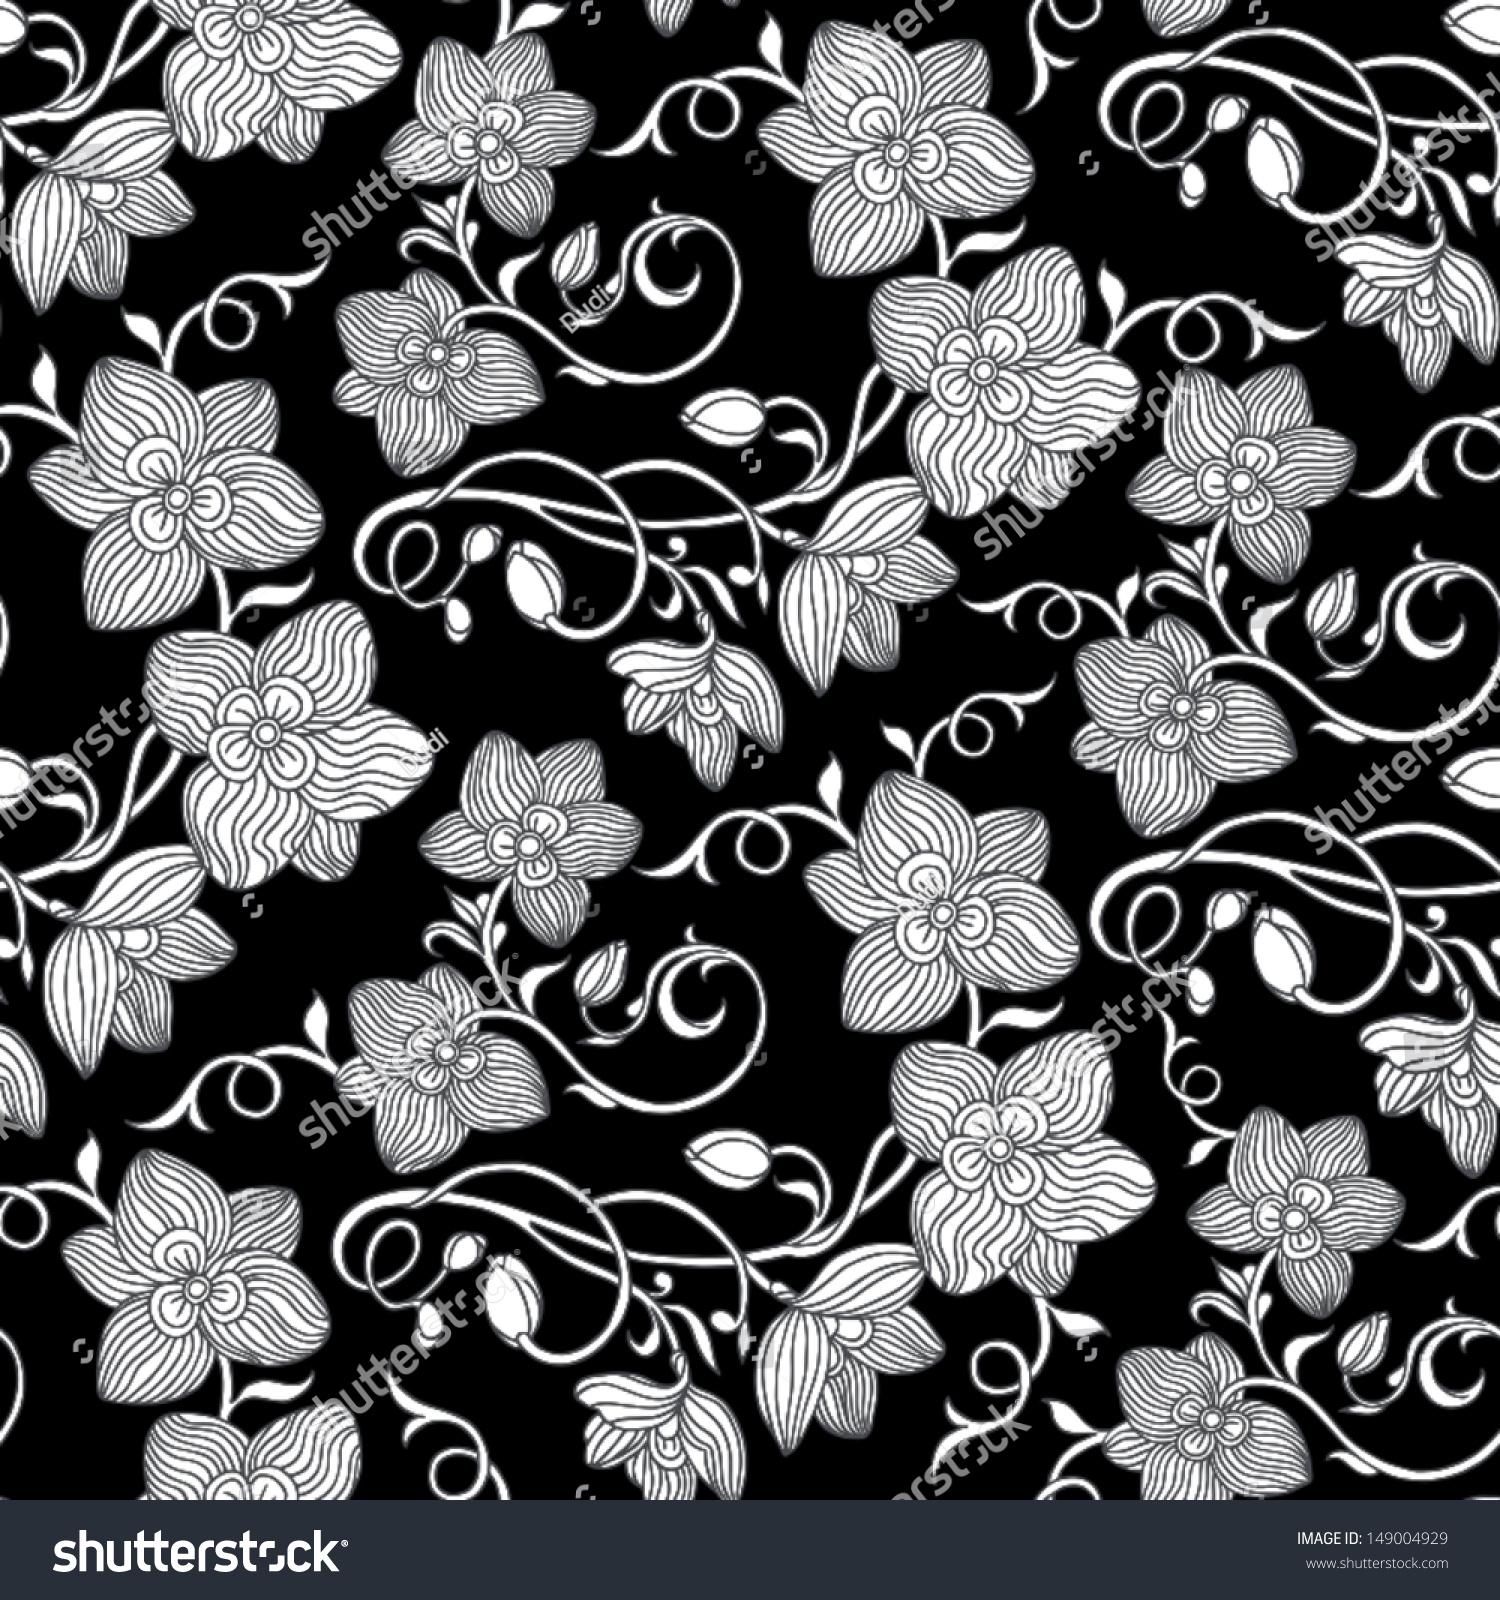 Vintage Black Floral Seamless Pattern On Dark Stock Vector ...   Black Floral Vintage Pattern